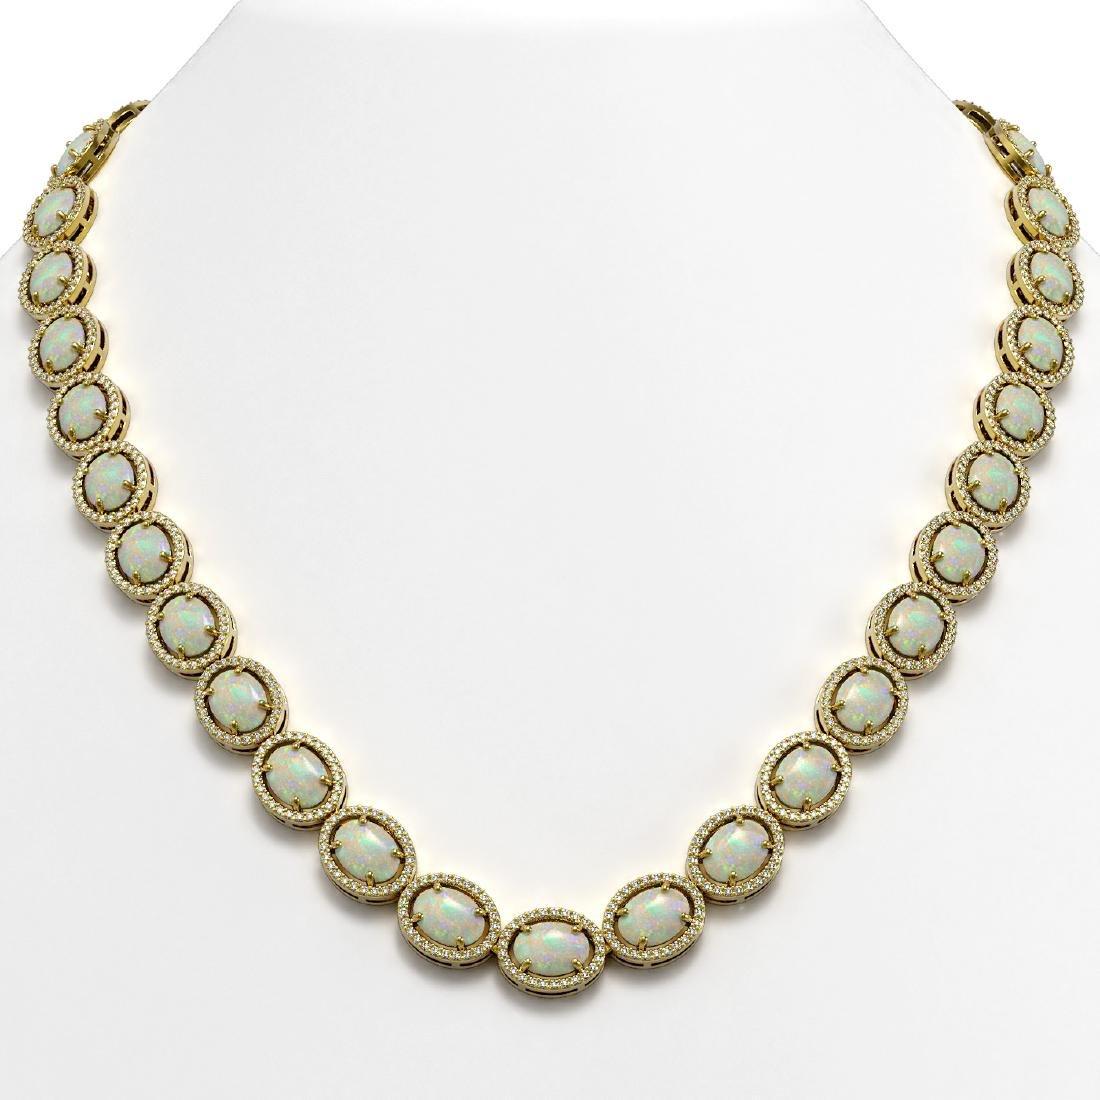 42.29 CTW Opal & Diamond Halo Necklace 10K Yellow Gold